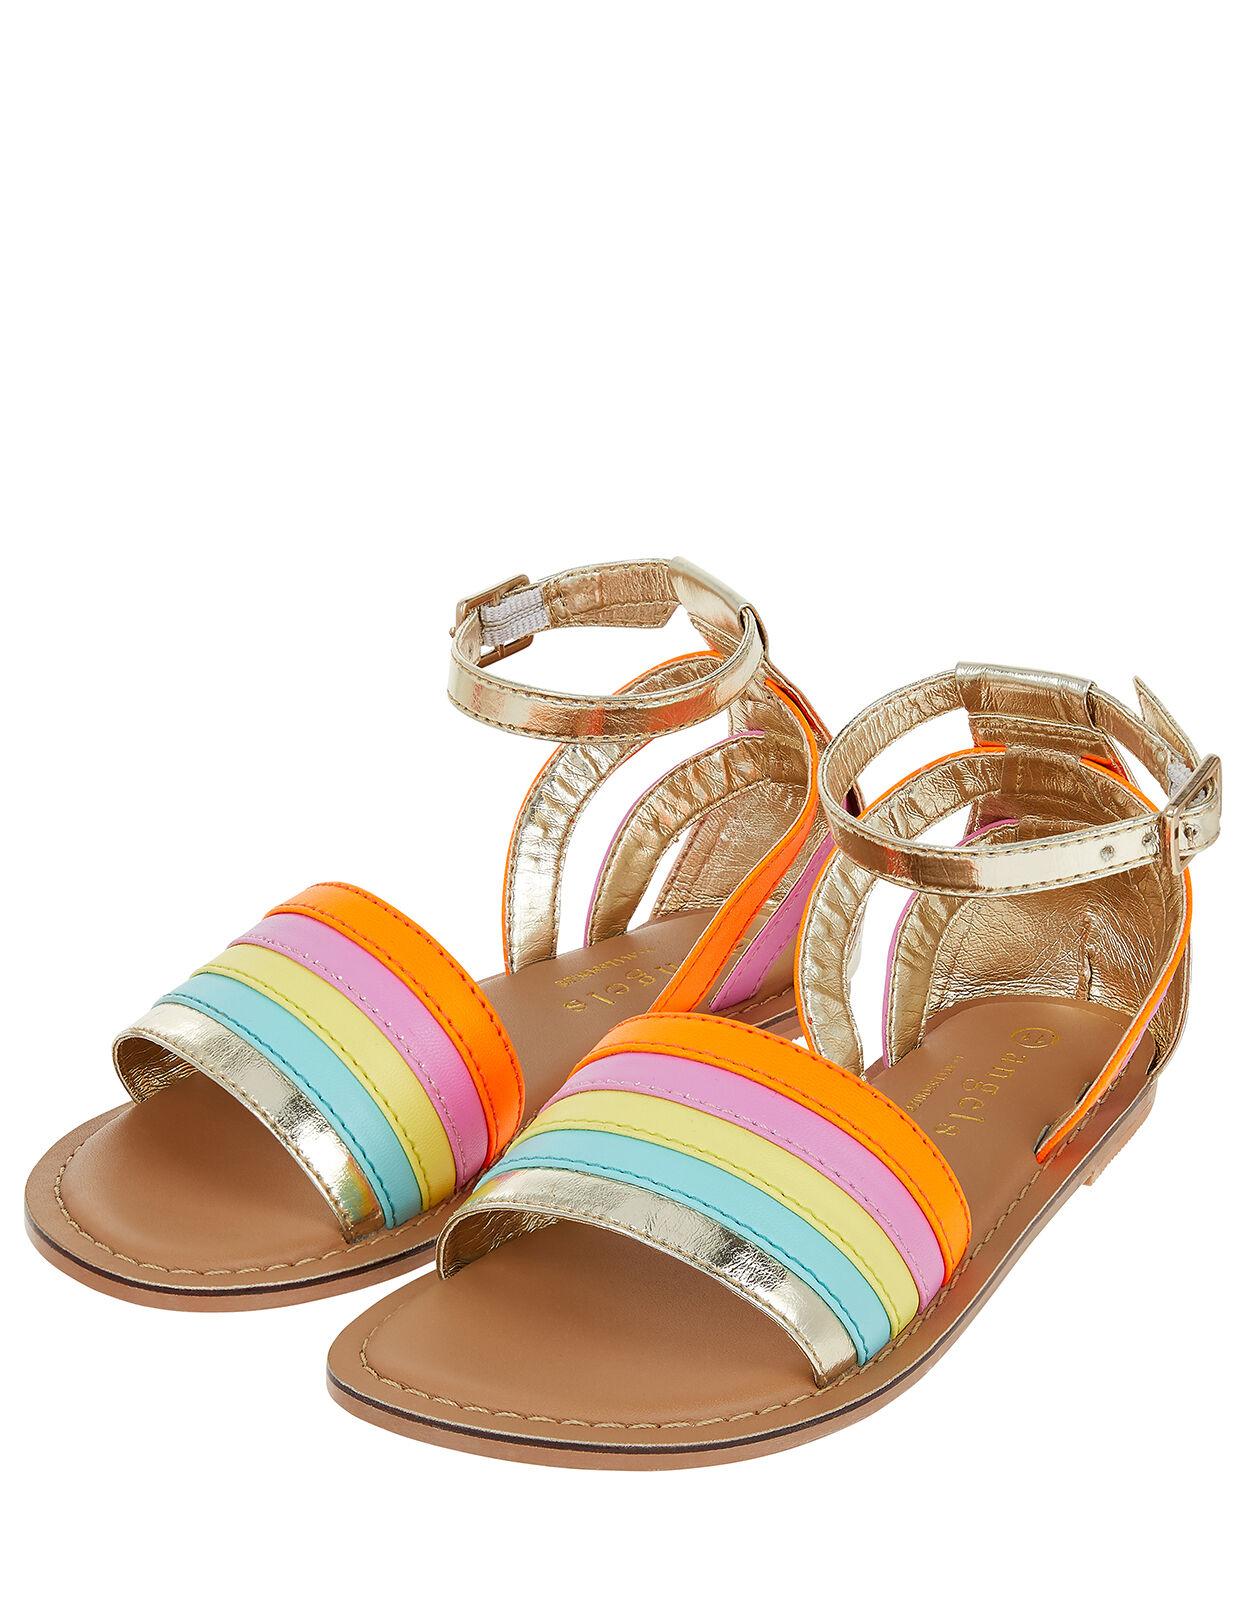 Girls flat shoes | Girls | Accessorize